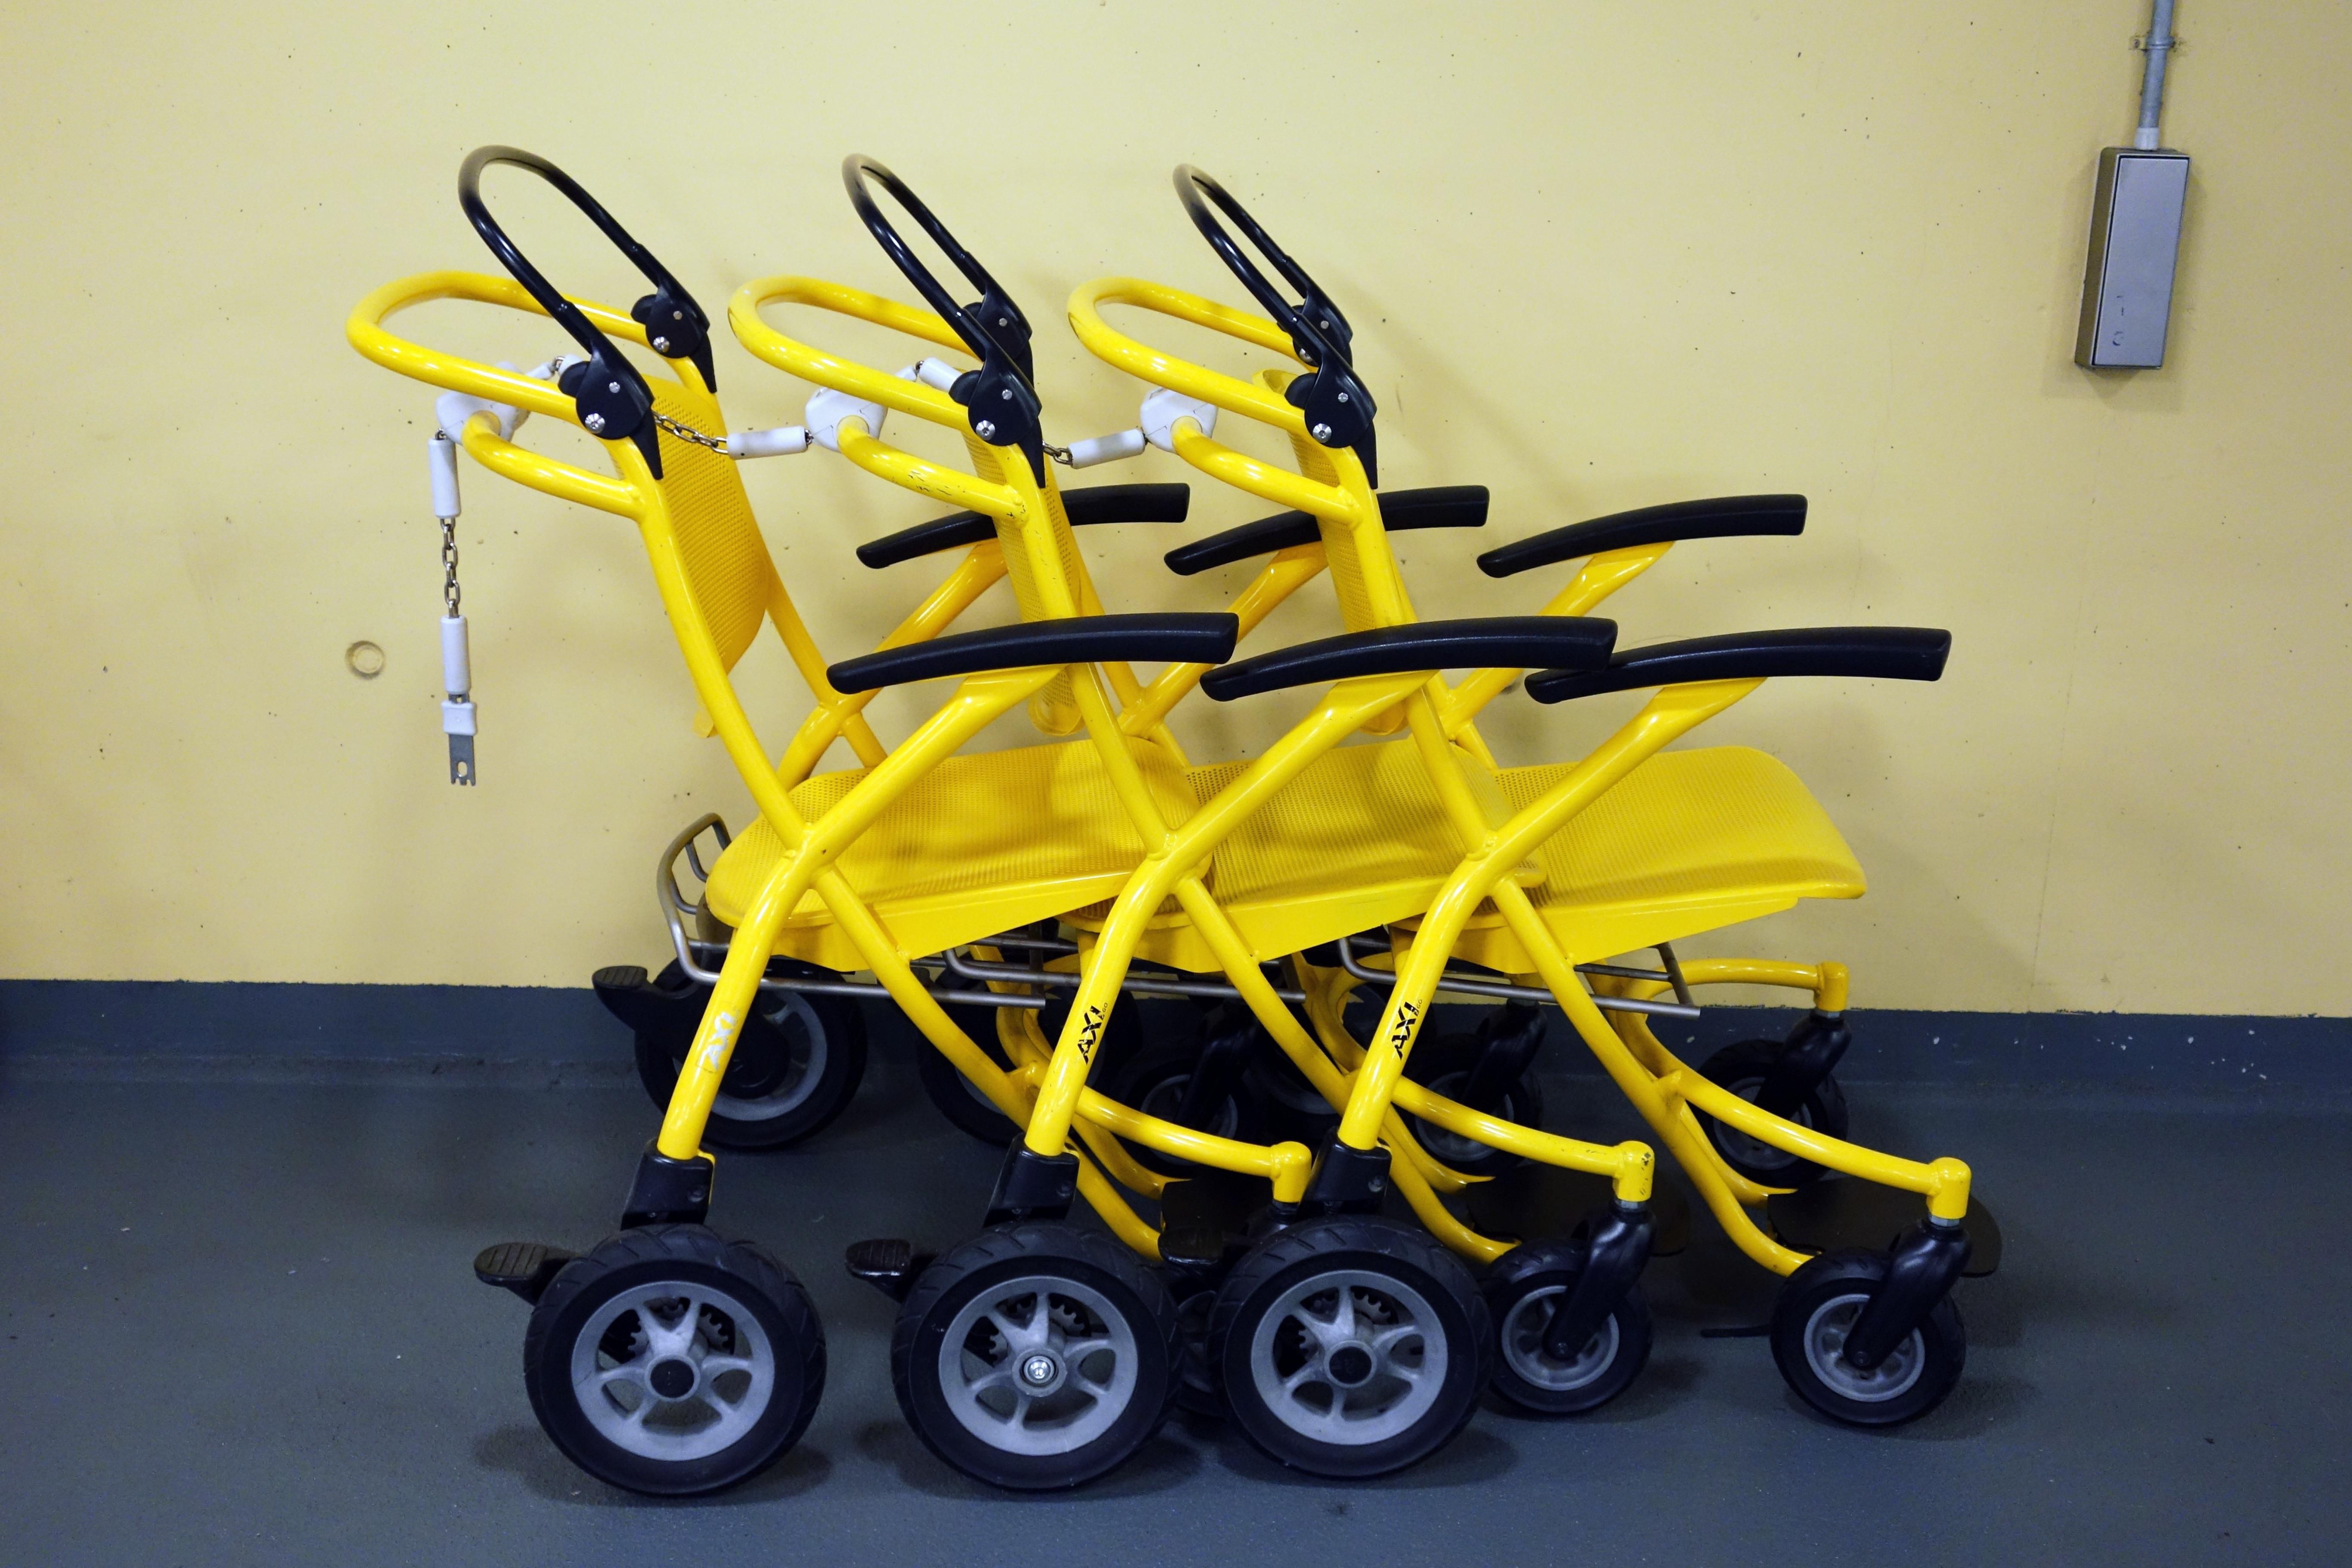 Fotos Gratis Rueda Carro Transporte Vehiculo Maquina Amarillo